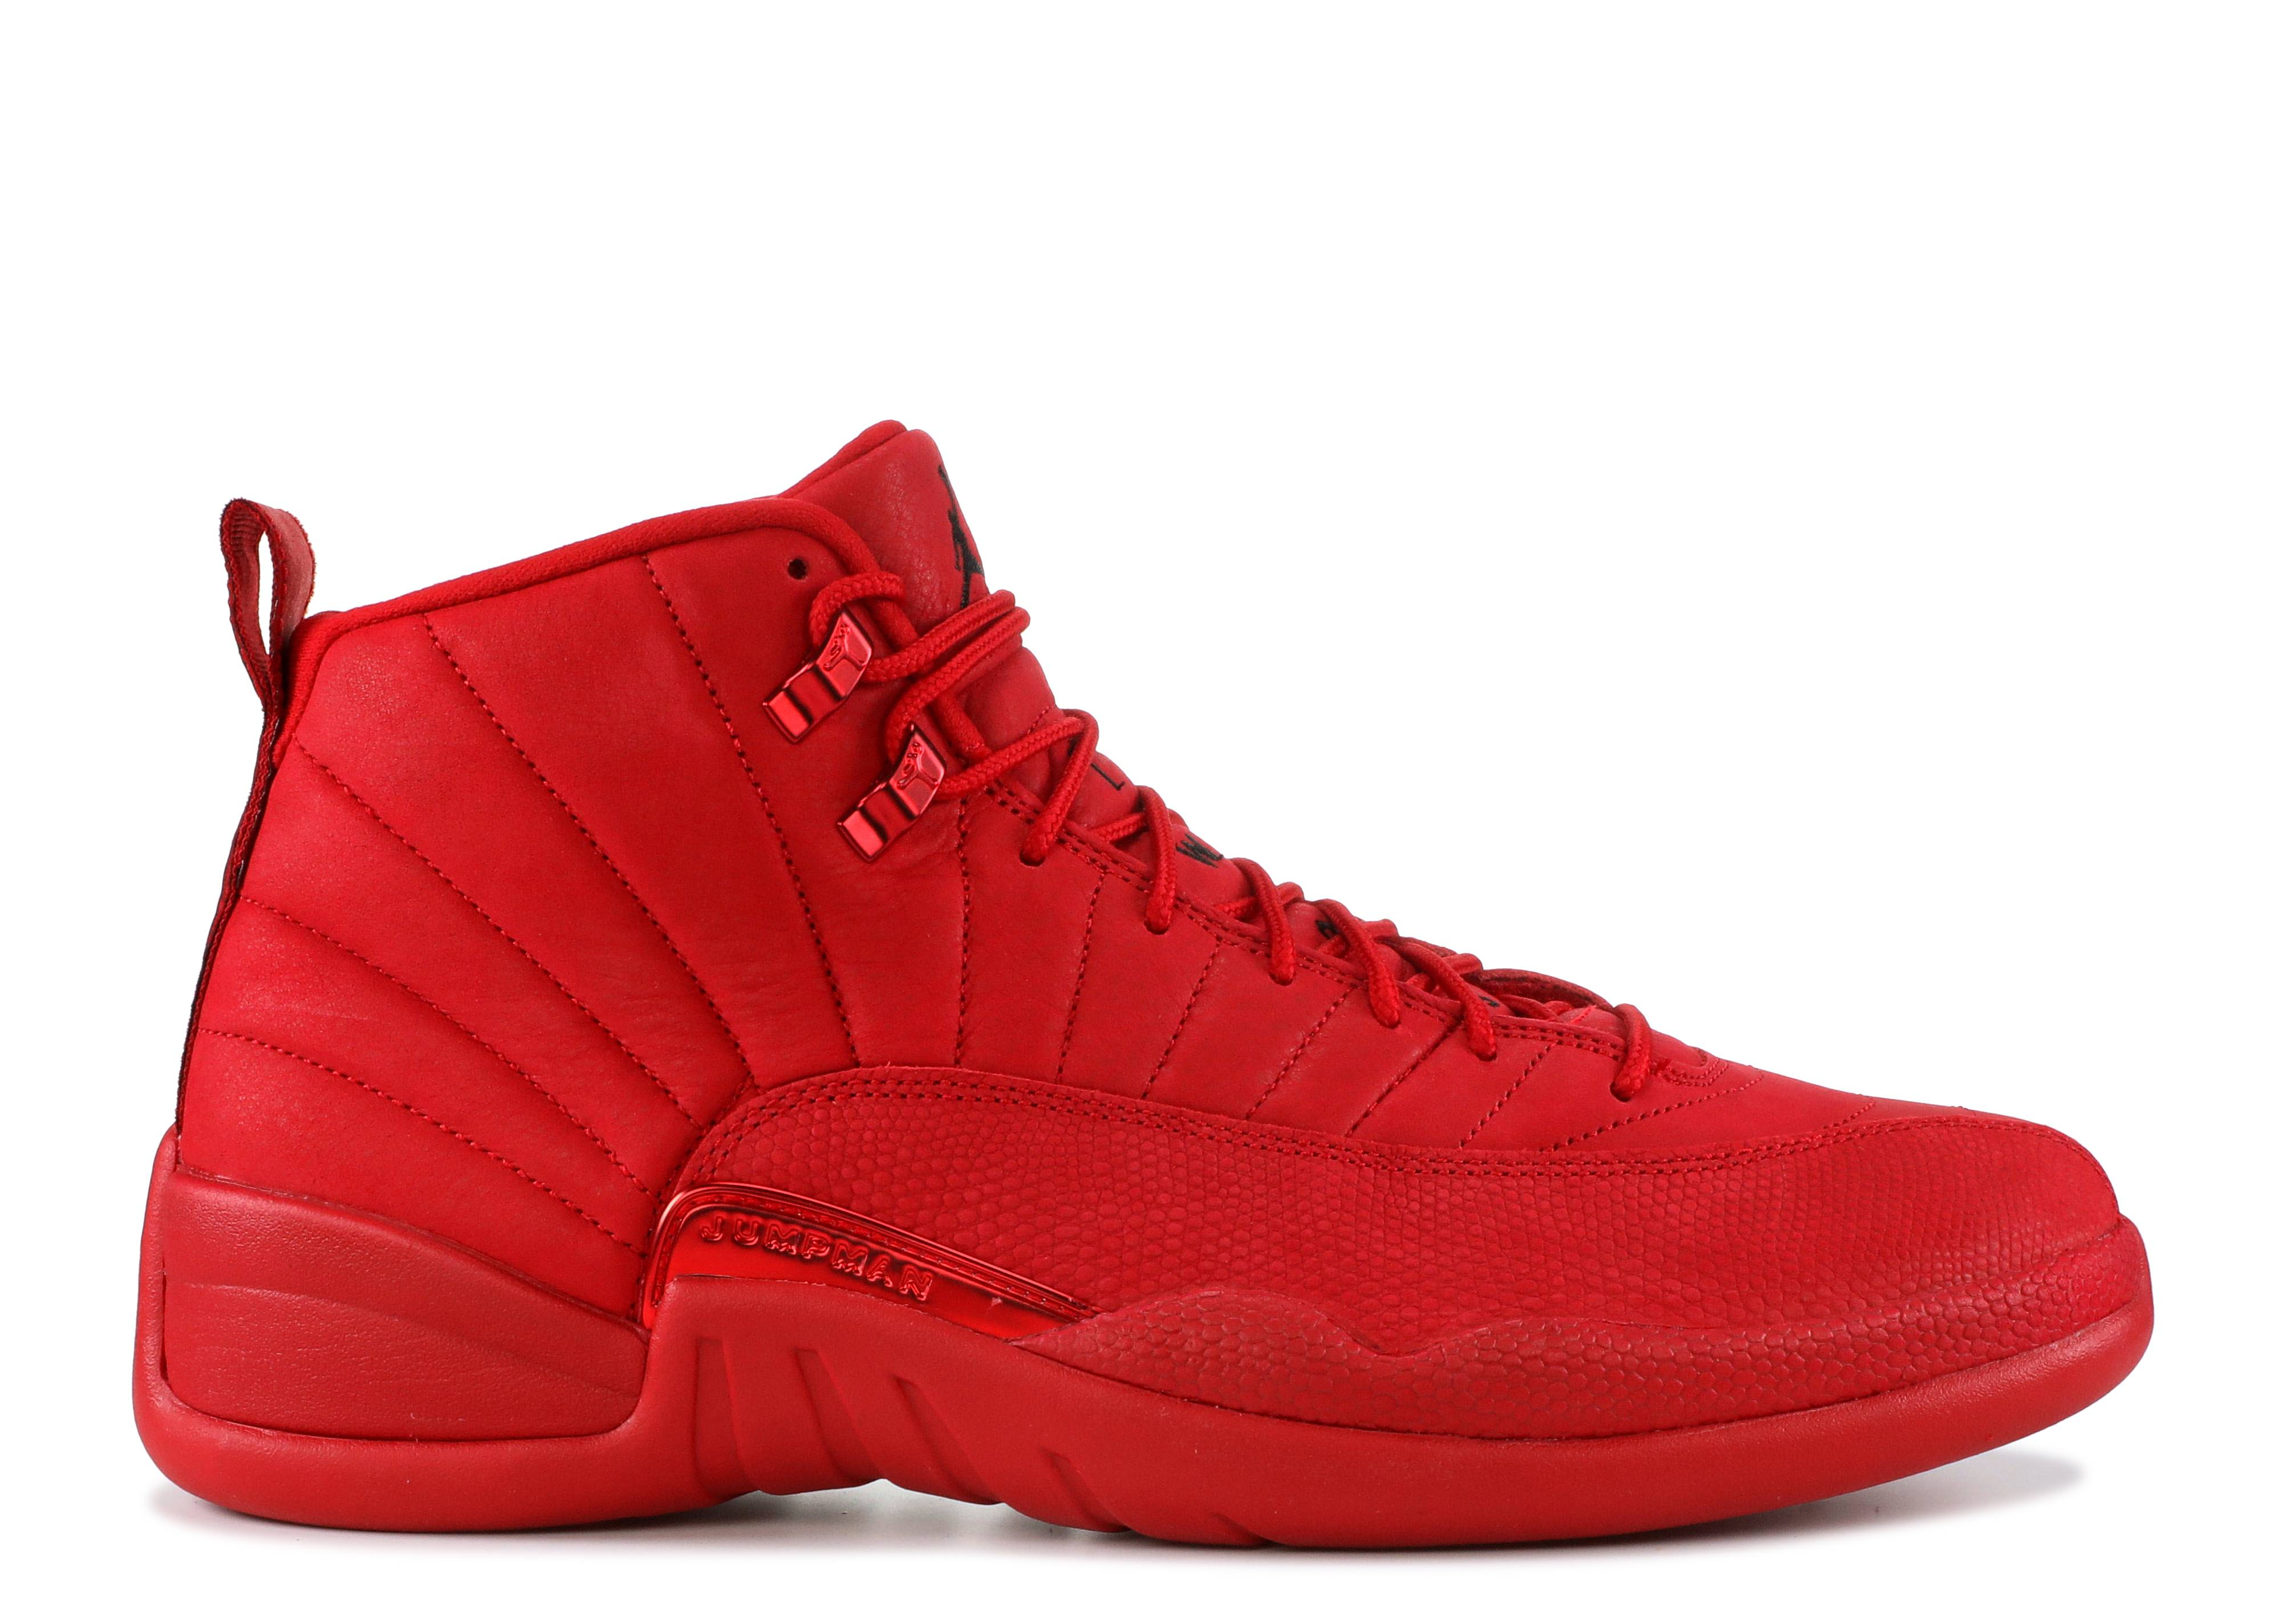 jordans 12 all red